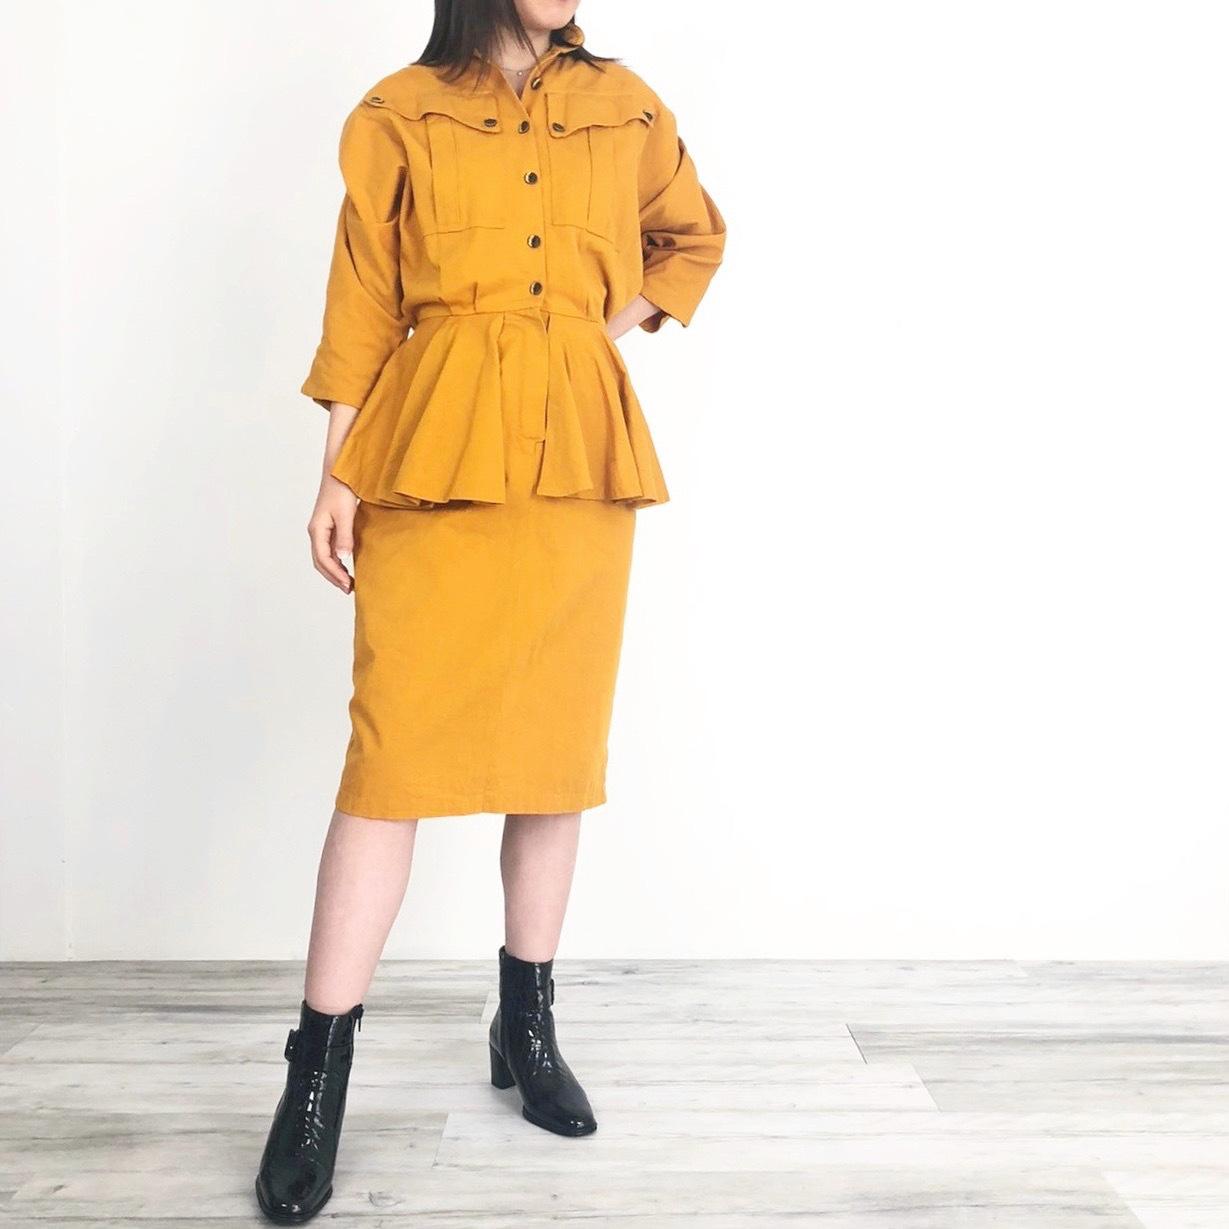 ◼︎80s vintage peplum dress from U.S.A.◼︎